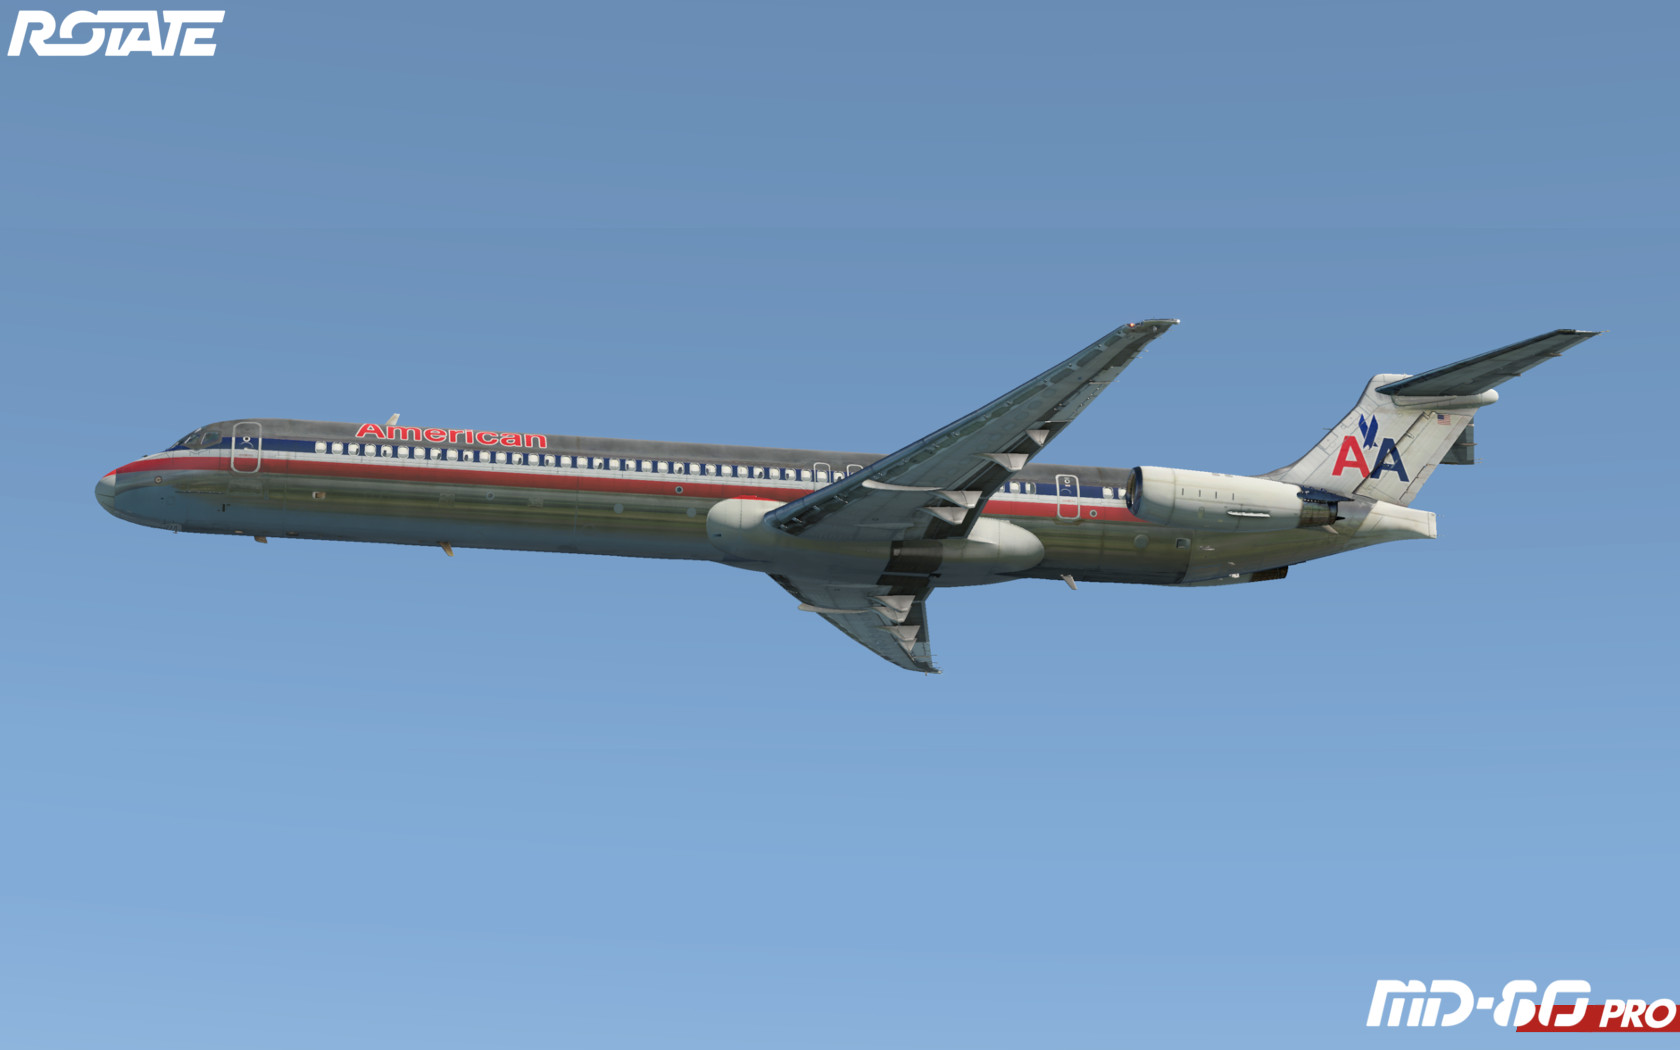 Rotate MD-80v1.31